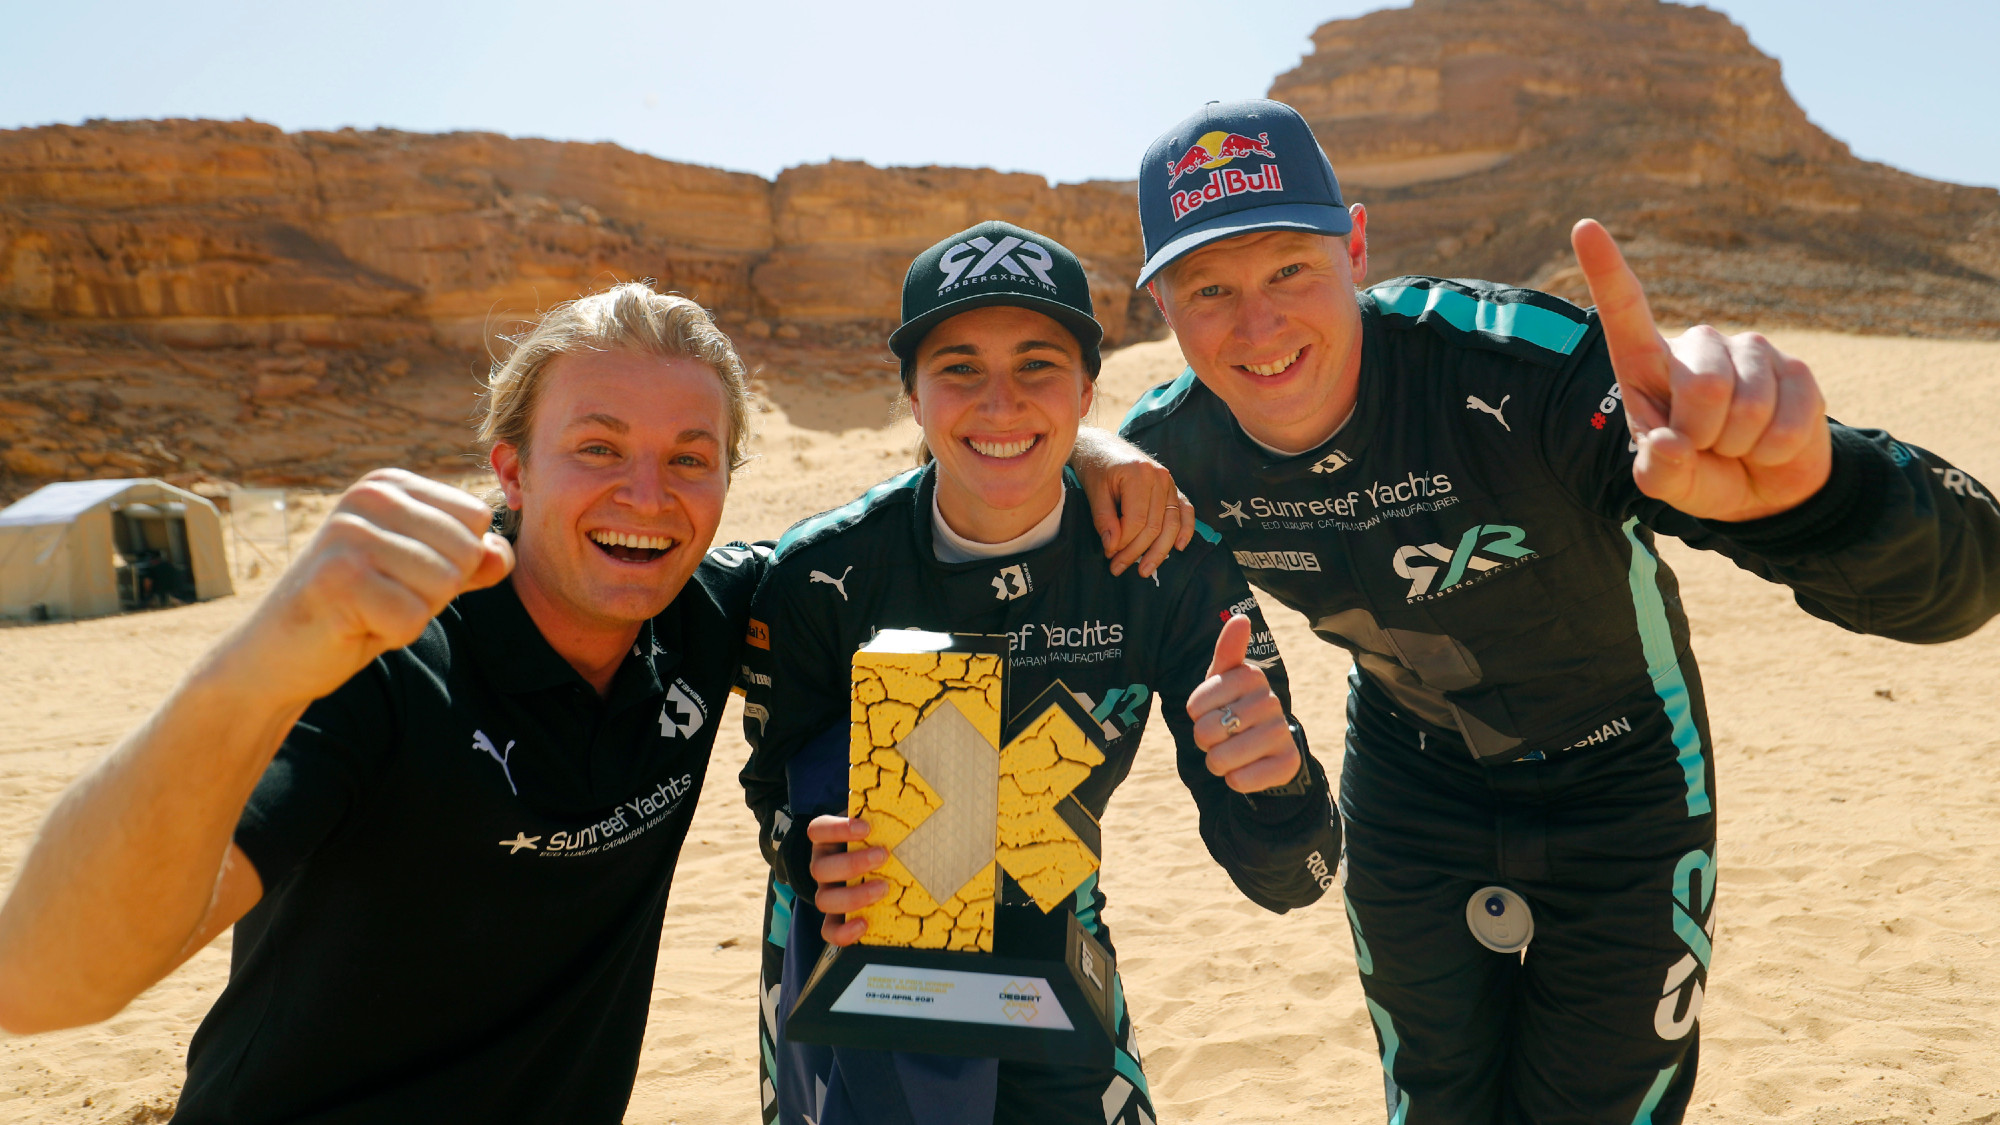 Rosberg Extreme E team